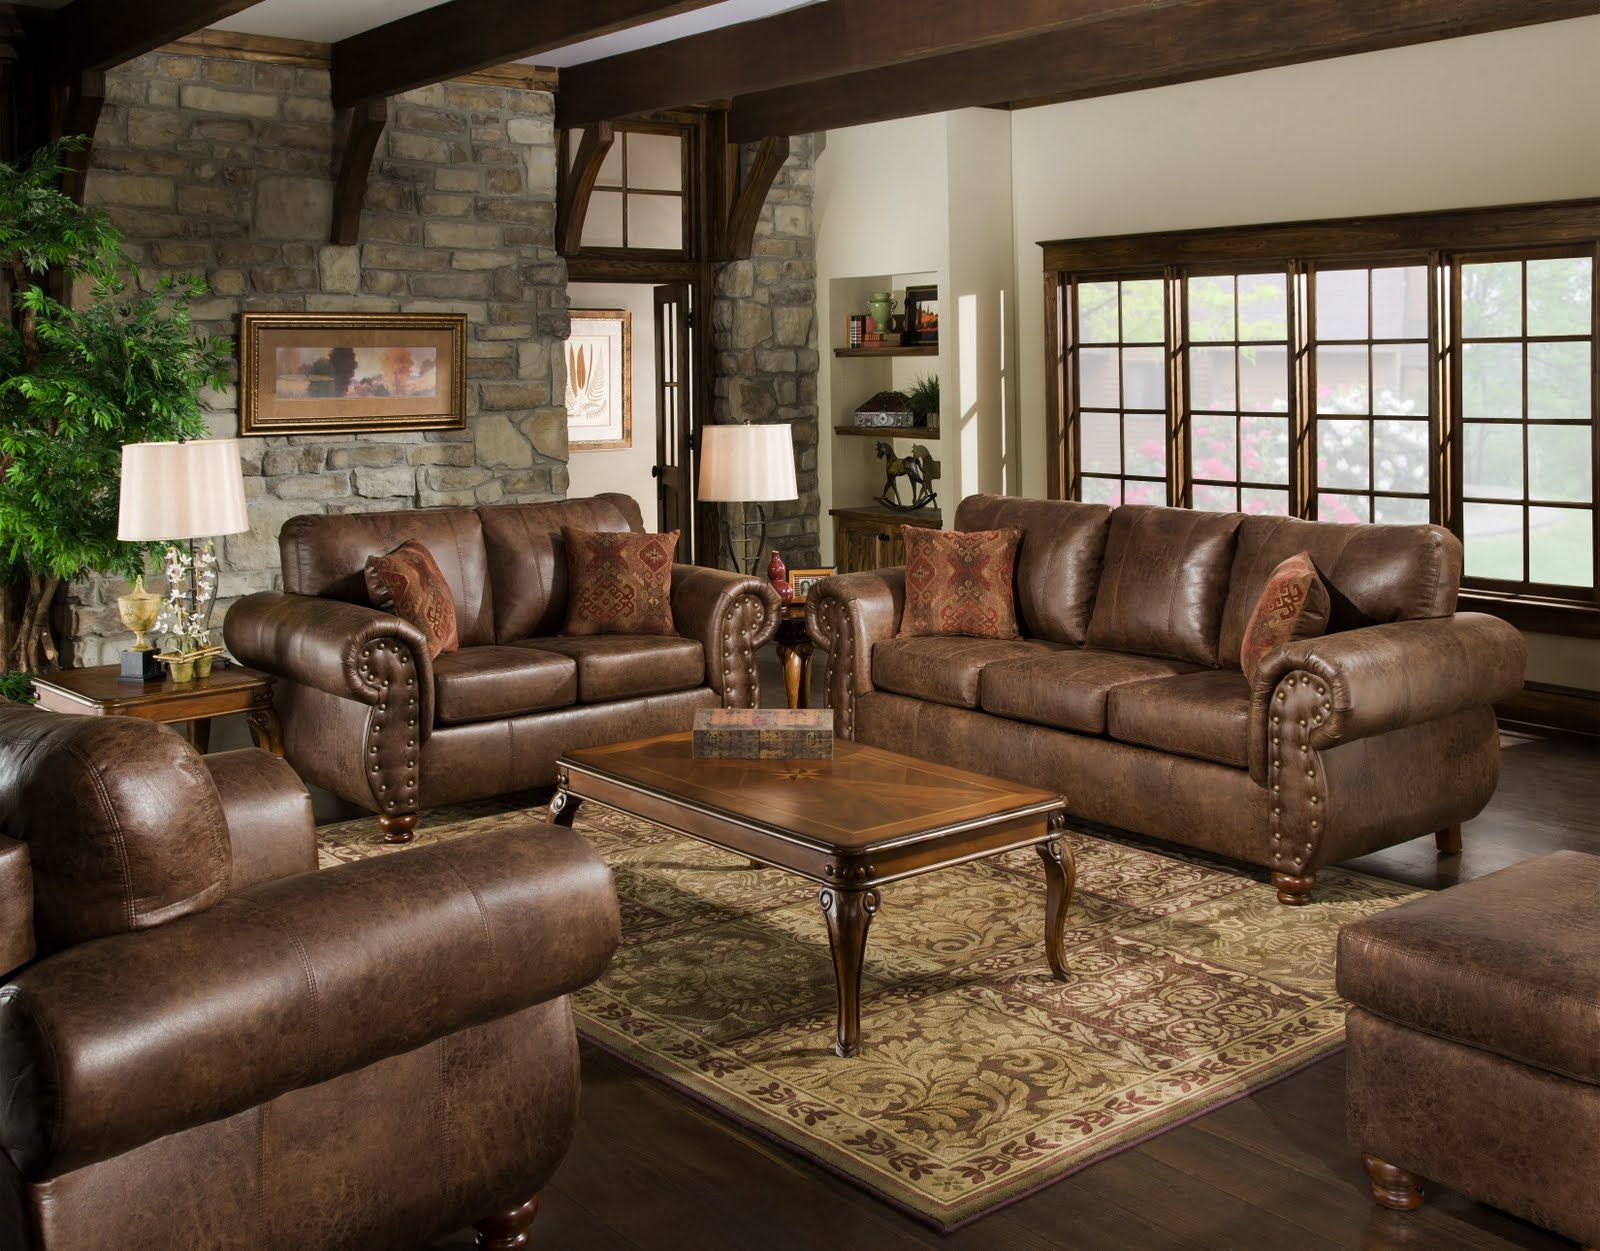 30 Colorful Beautiful Living Room Decor Crest Leather Sofa